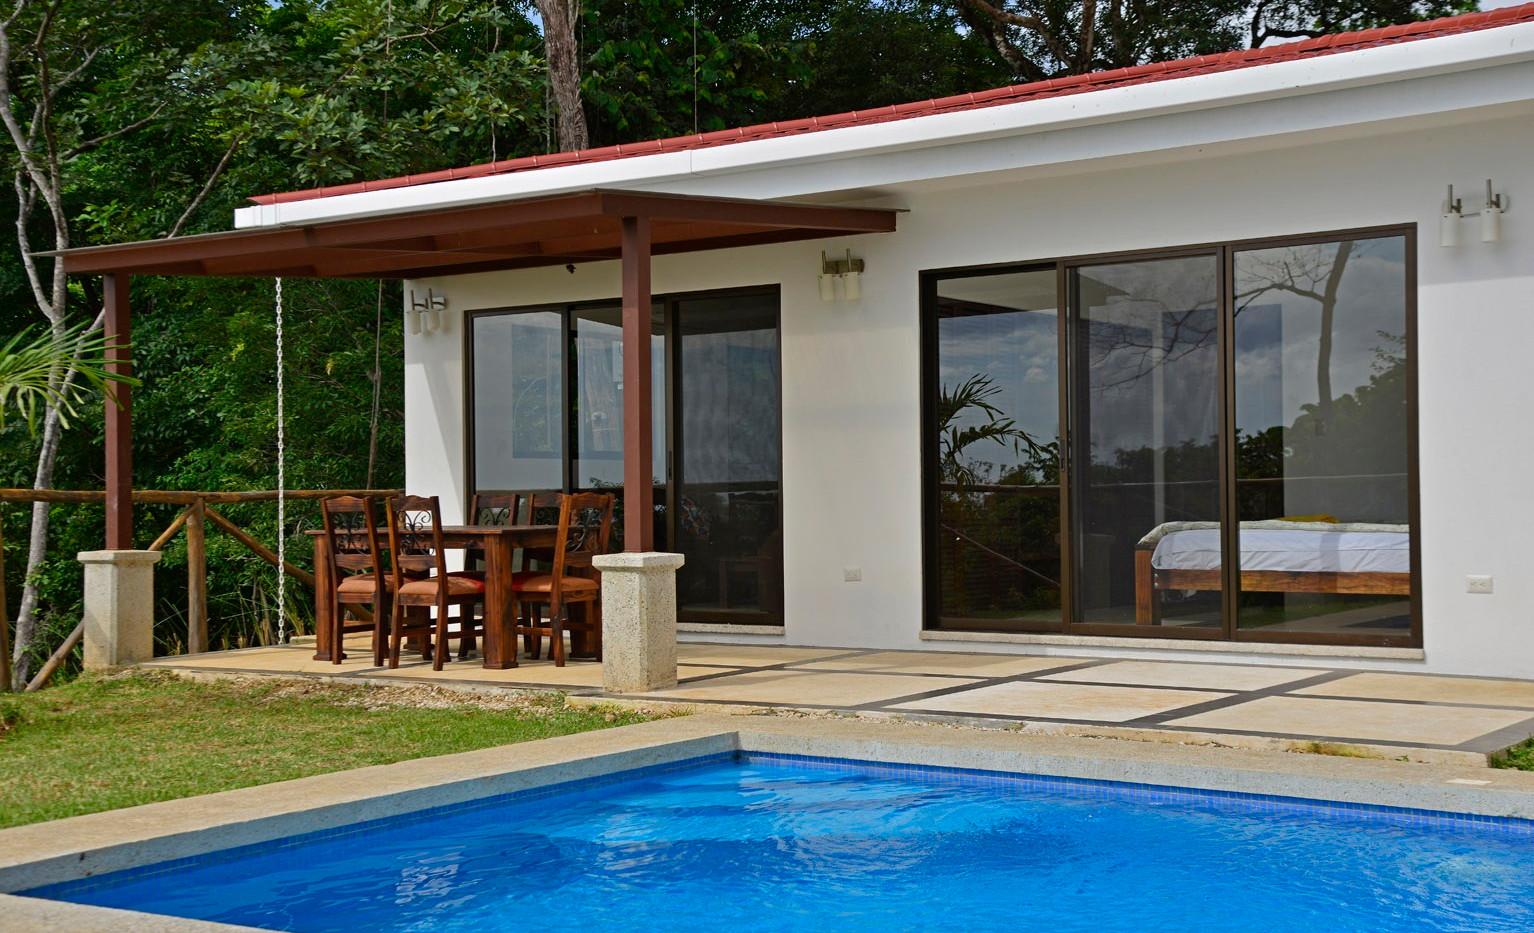 Custom home with pool.